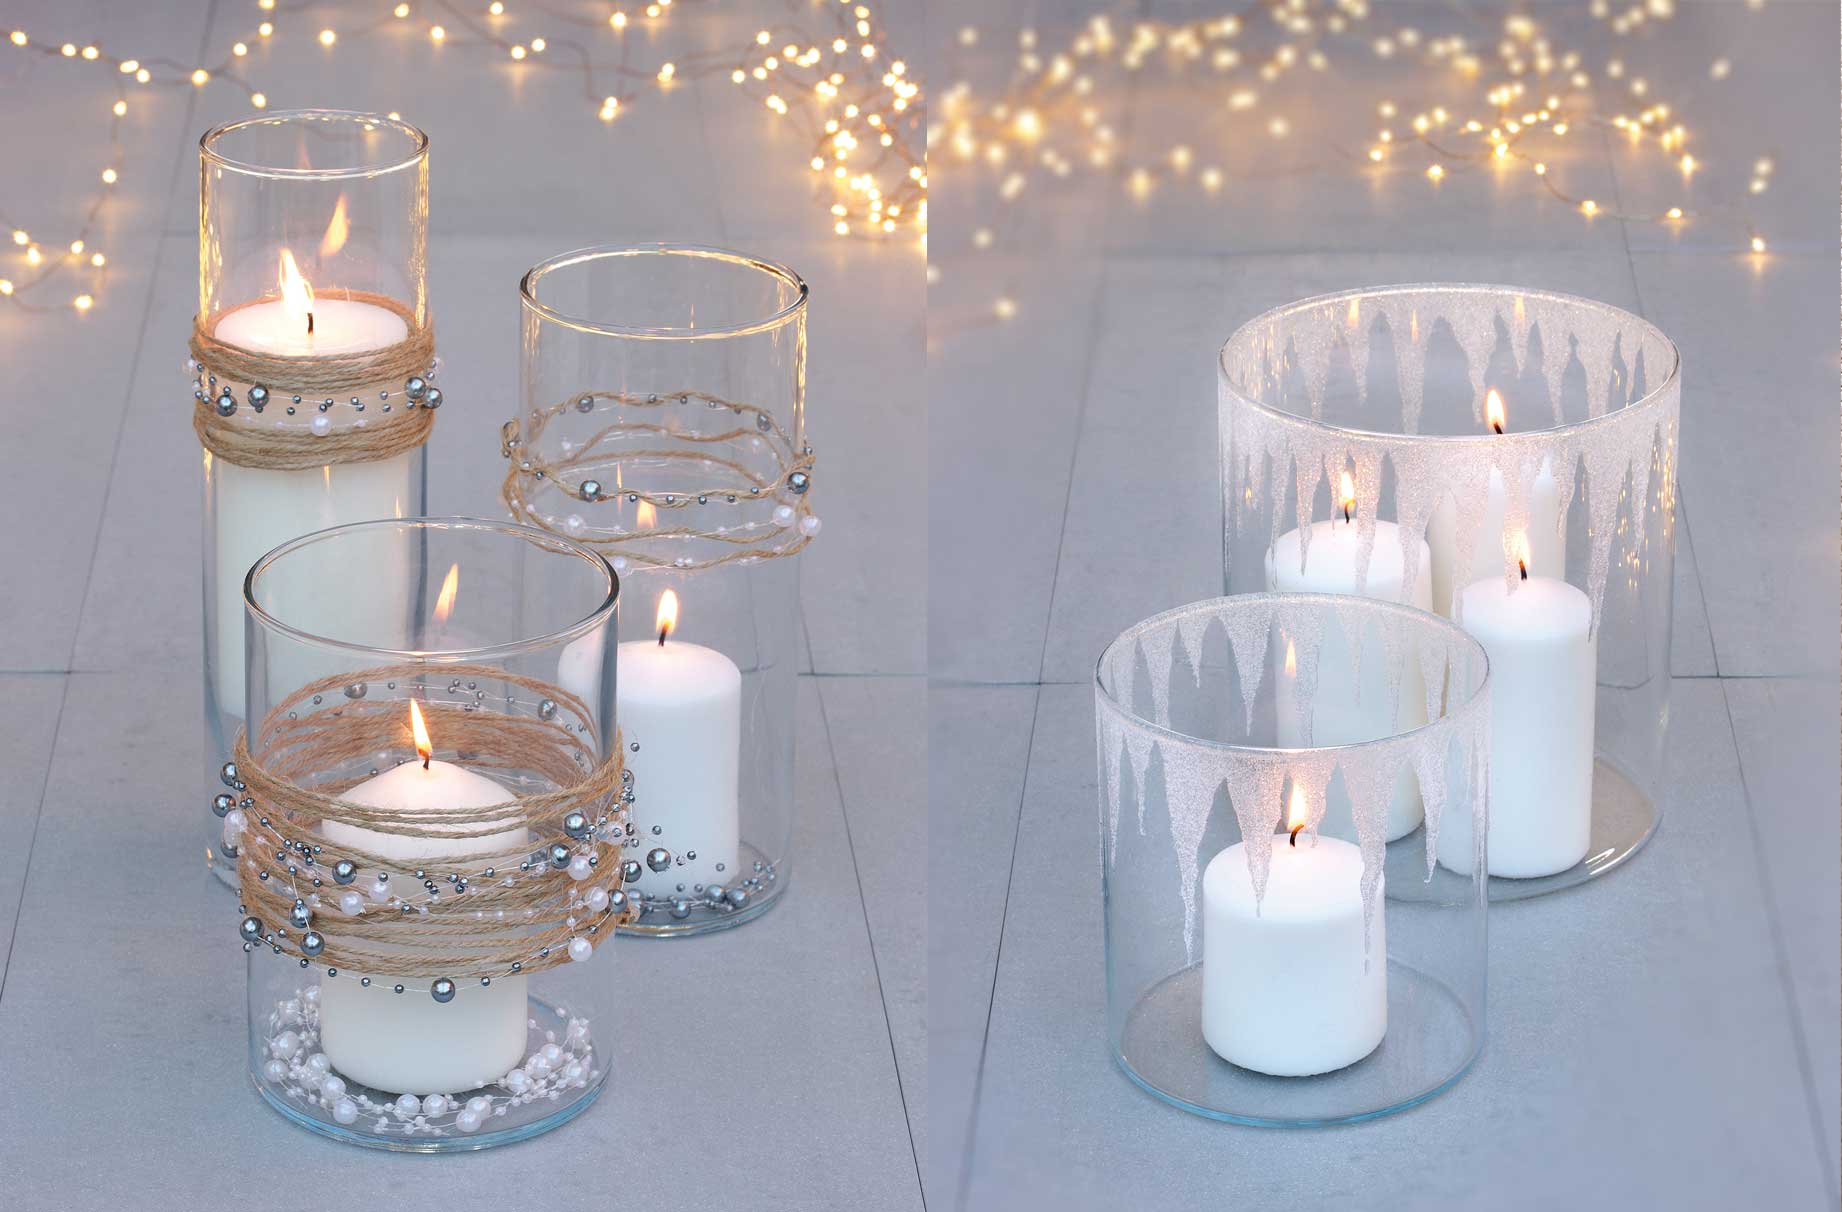 How to make Christmas candles